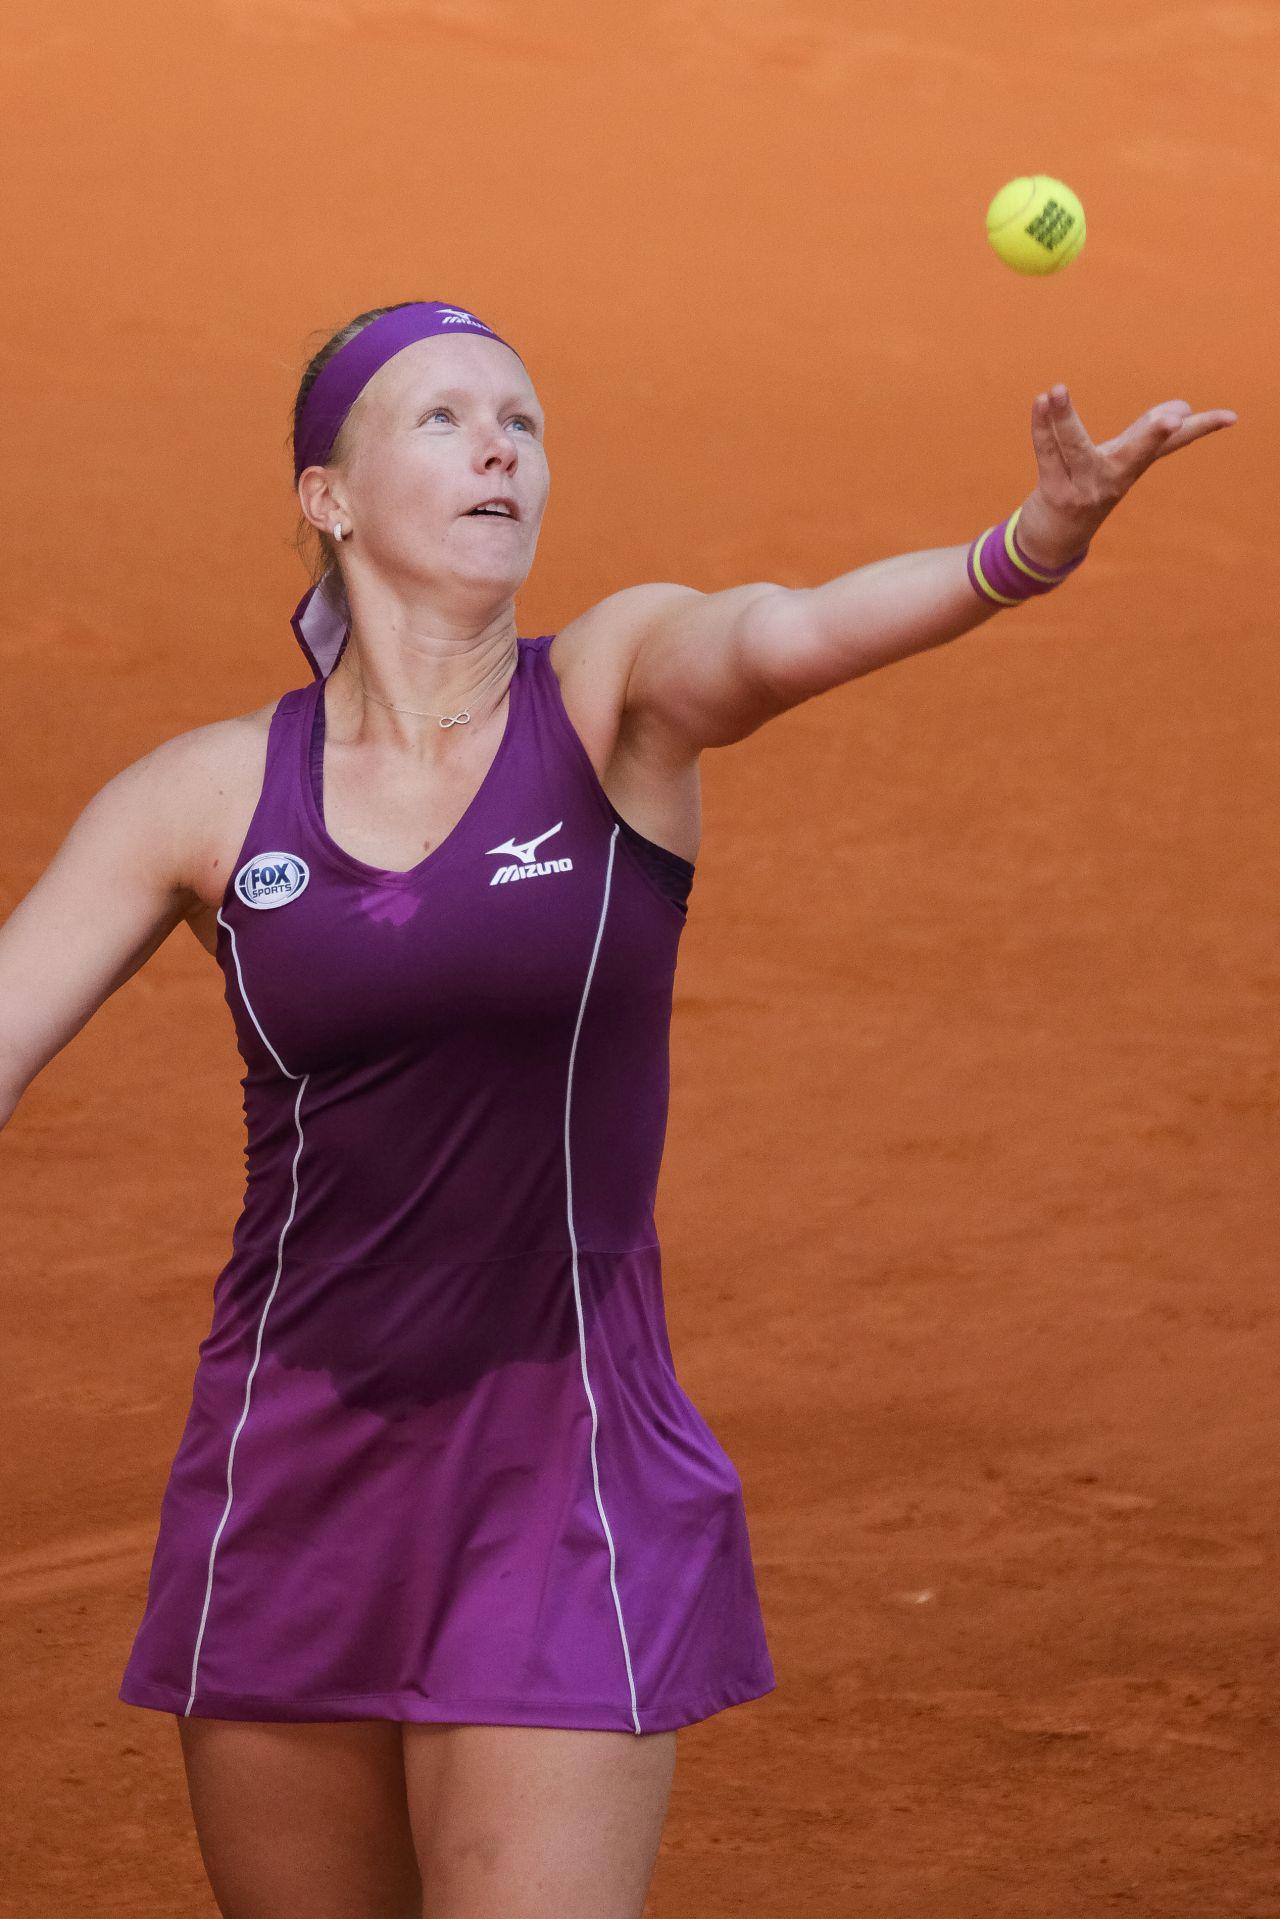 Kiki Bertens – WTA Tour, Nuremberg Cup 05/25/2018  |Kiki Bertens